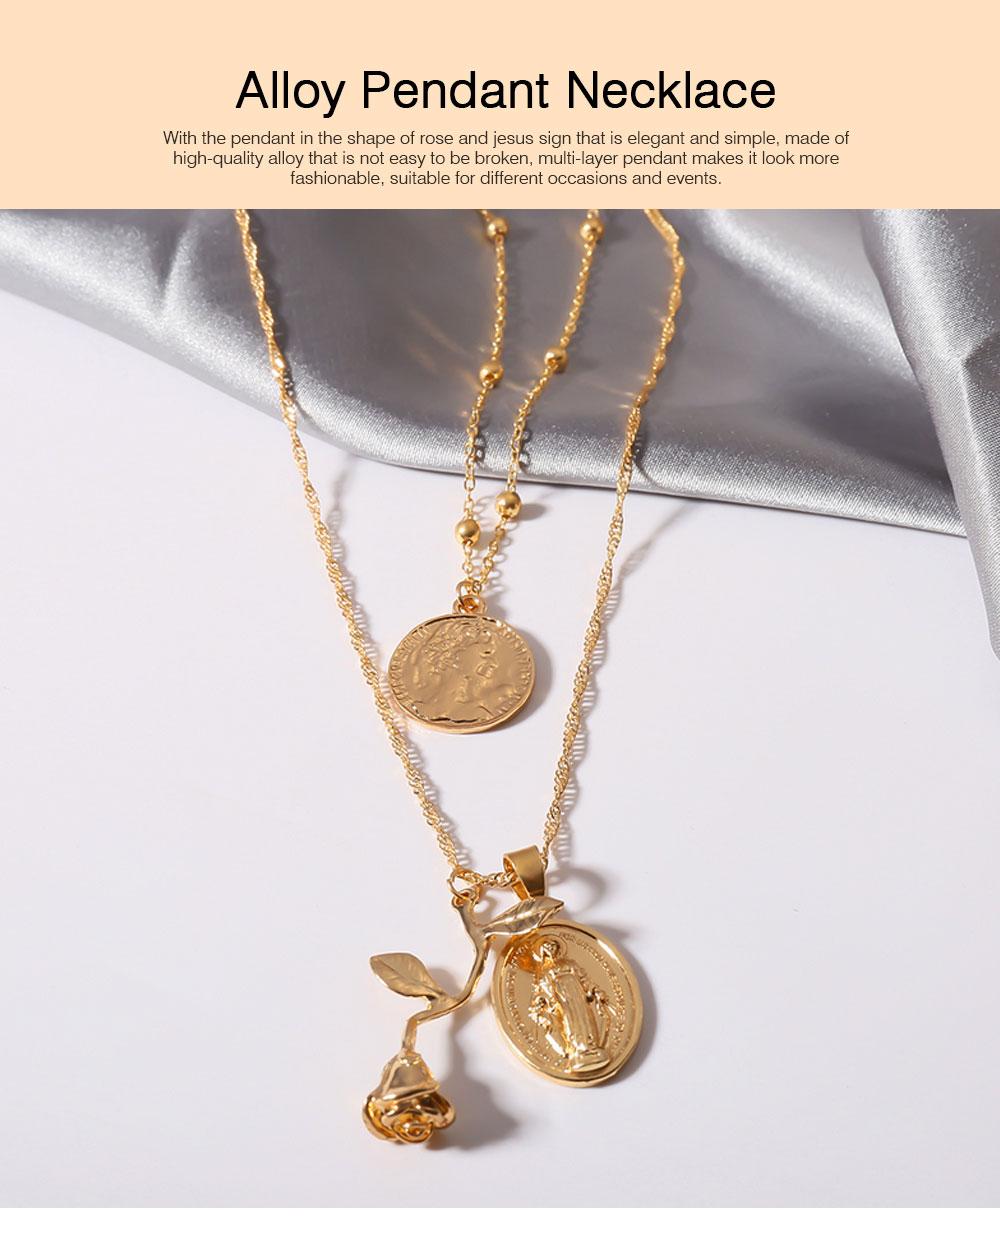 Women Alloy Pendant Necklace, Multi-layer Retro Rose & Jesus Pendant Accessory Necklace Beauty Accessory Gold Silver 2 Colors 0